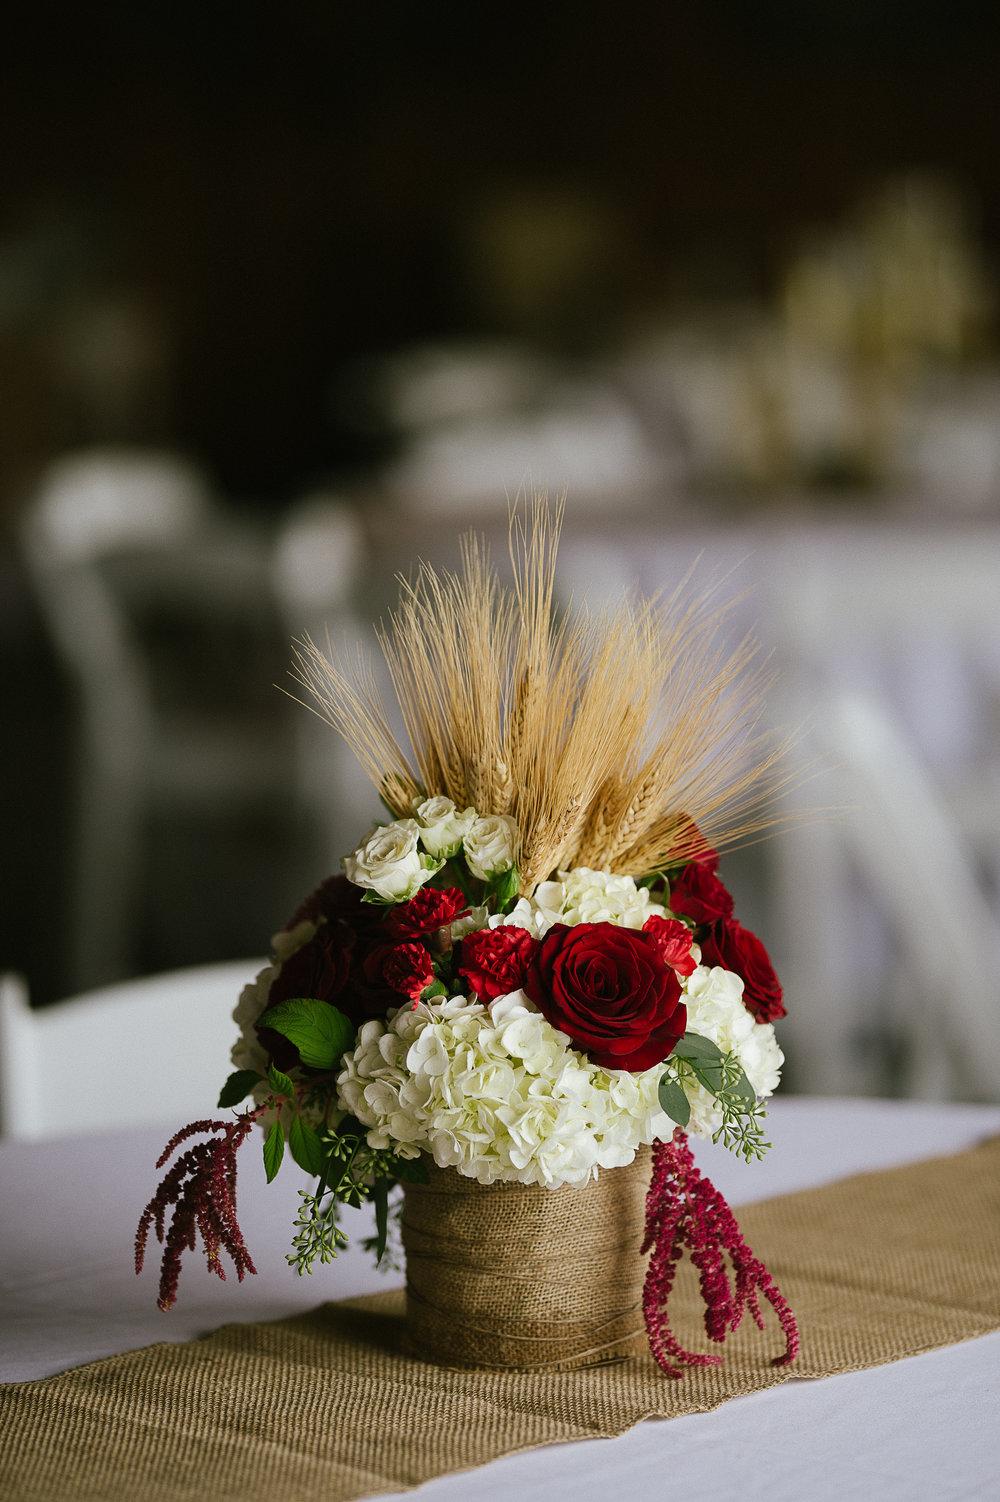 Swan Trail Farm Wedding_Sarah Schurman + Brian Skadan_Snohomish Wedding_Kelsey Lane Photography-5572.jpg